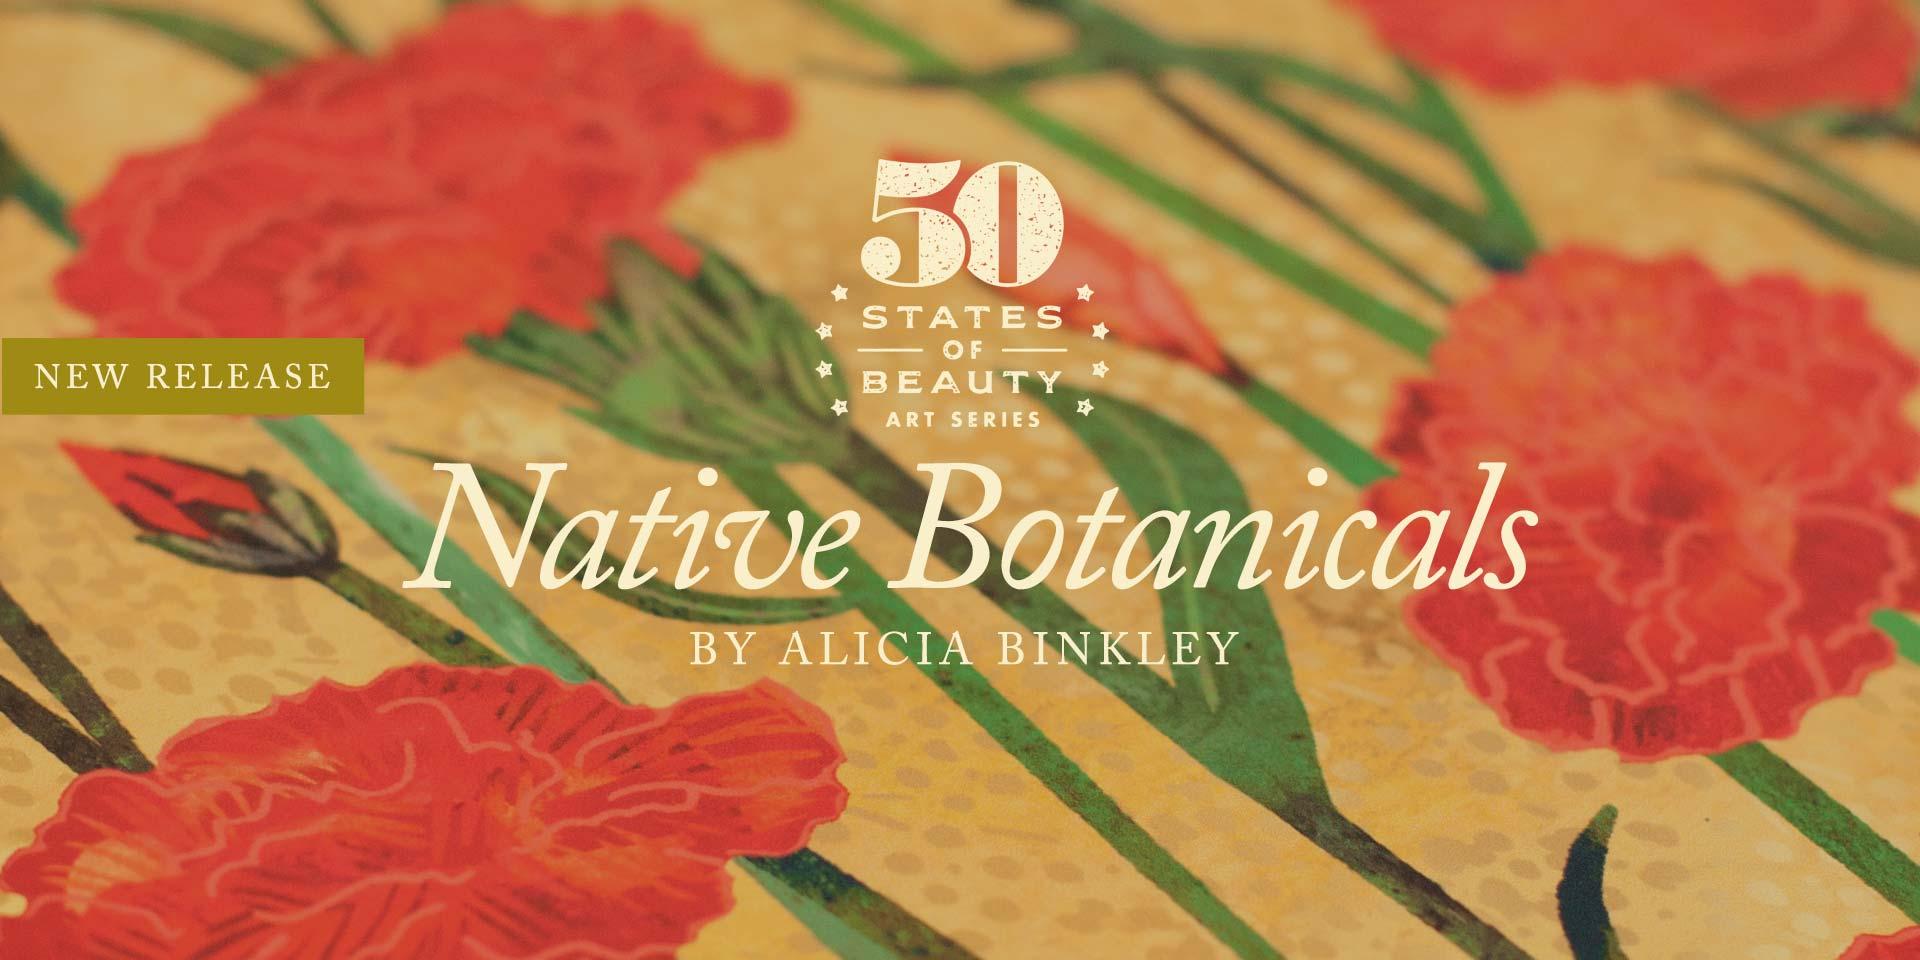 Native-Botanicals-slideshow-ohio-1920x960.jpg